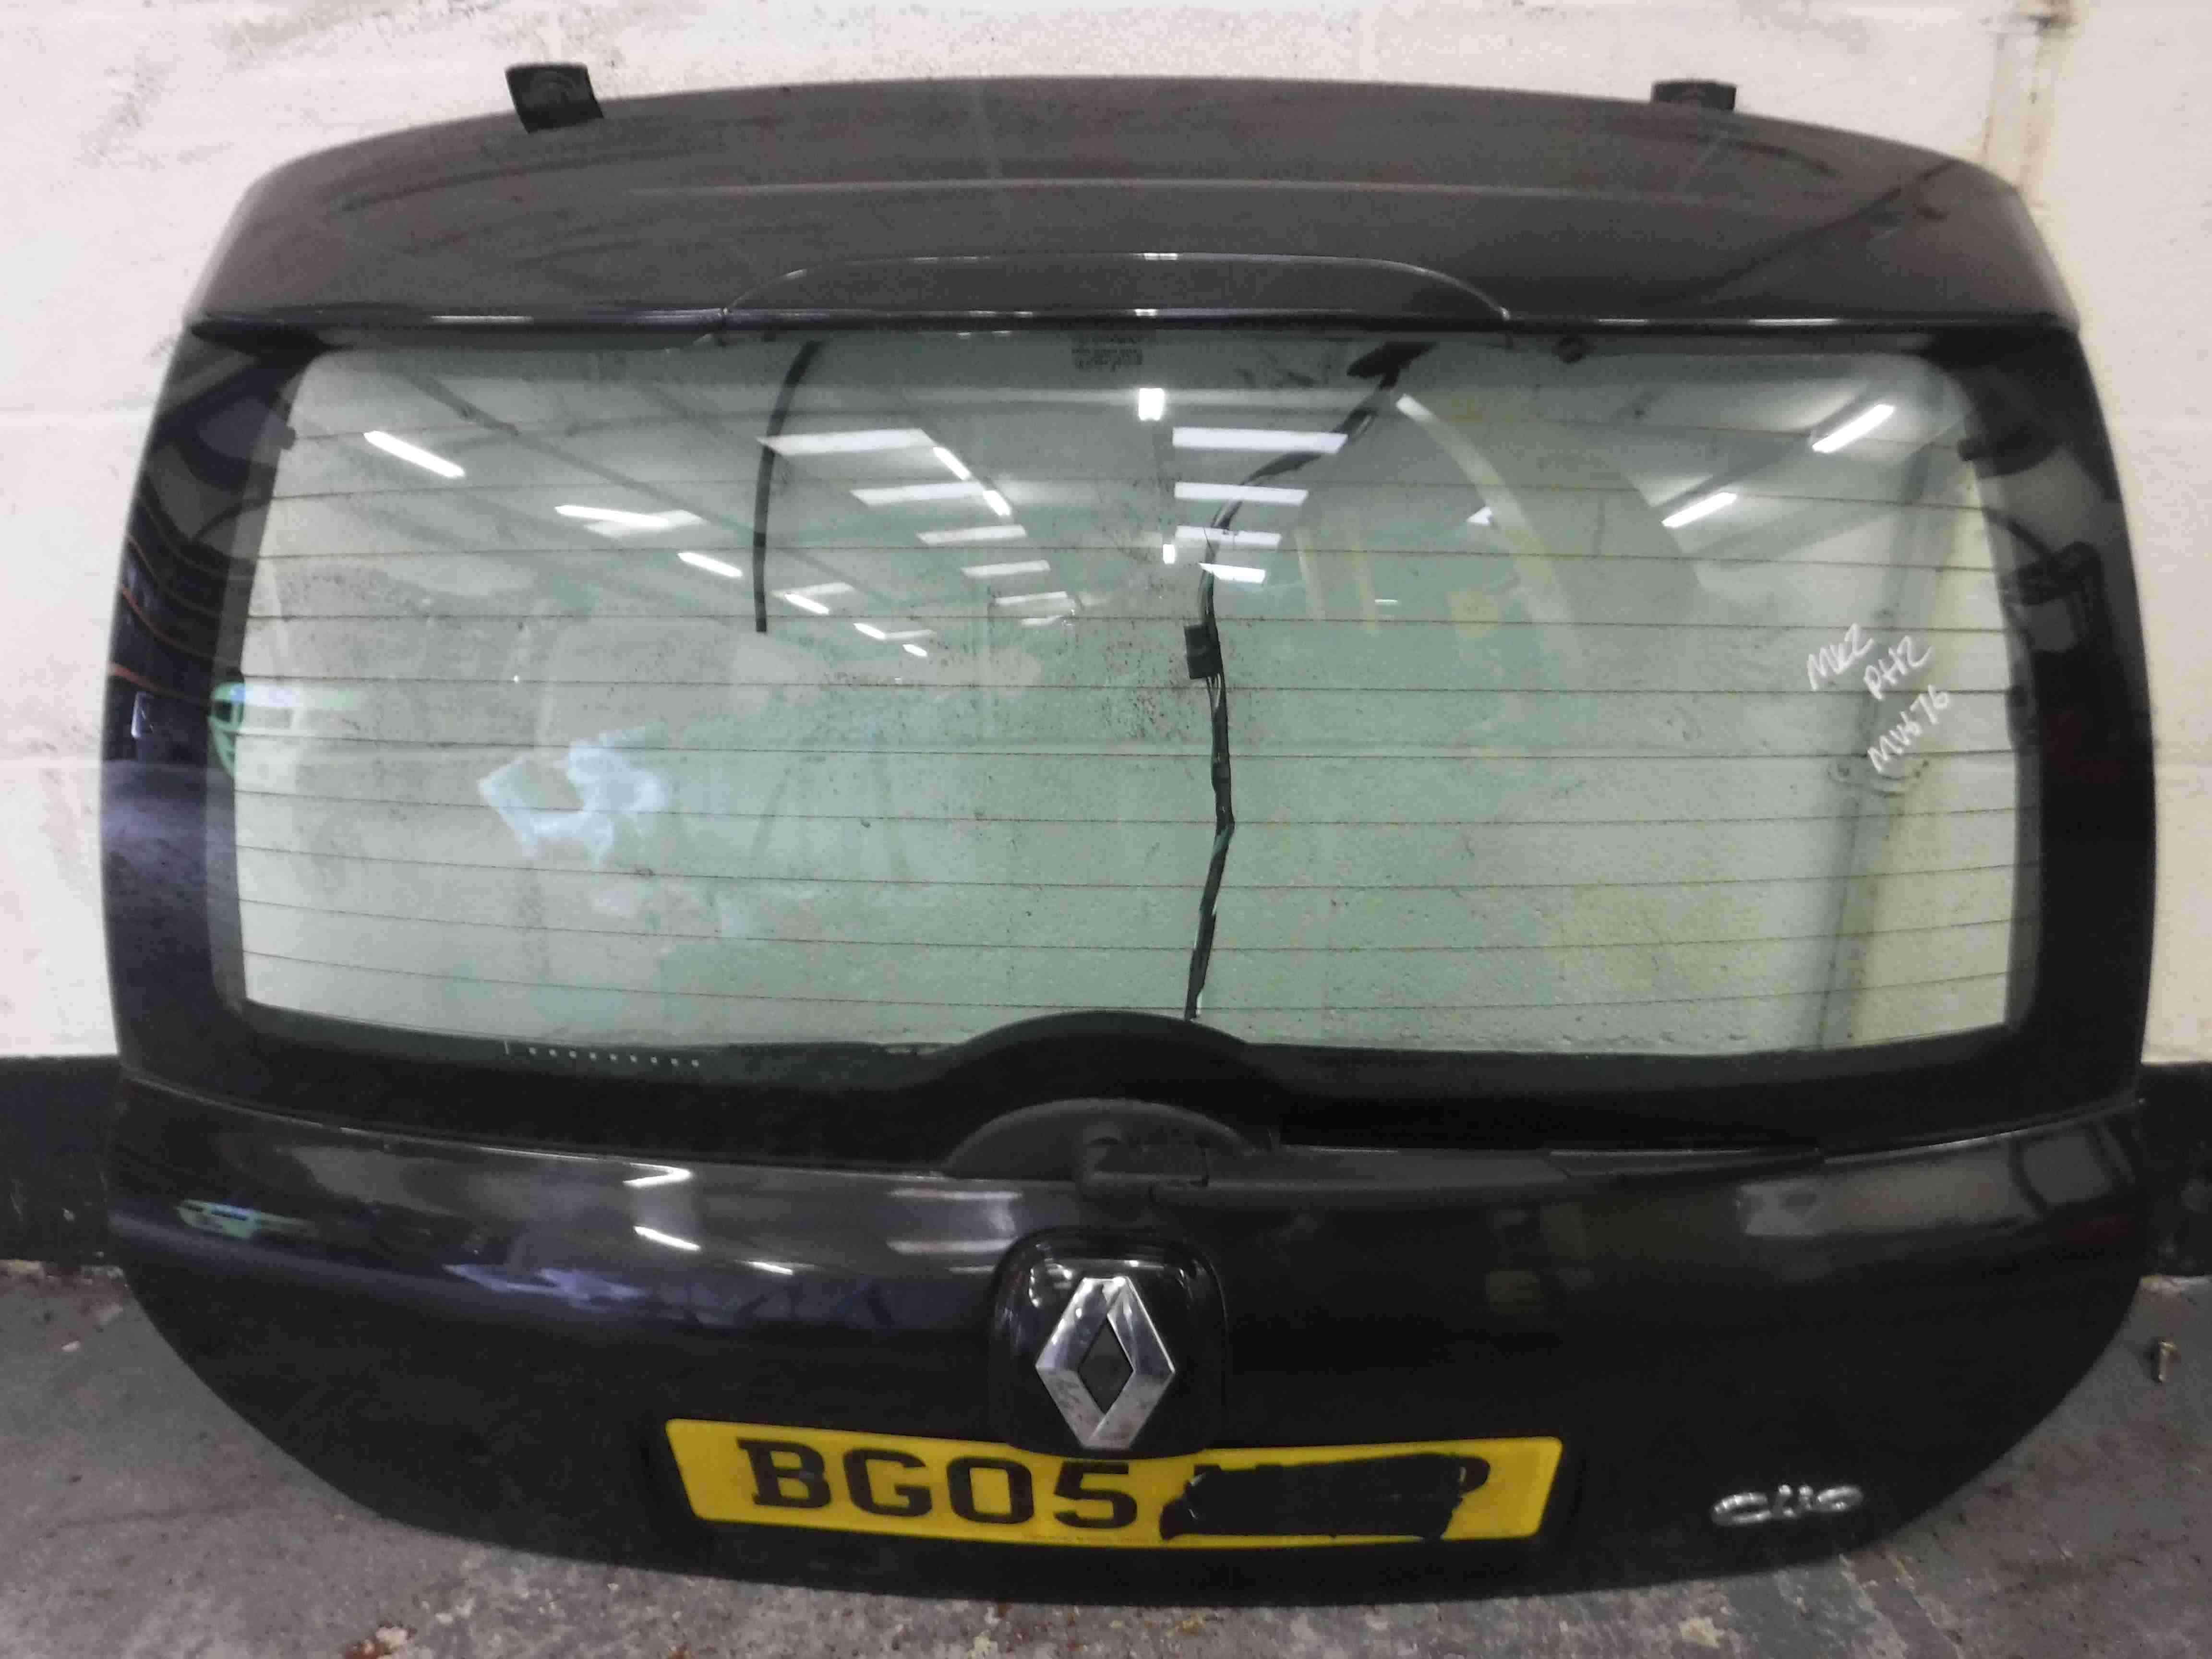 Renault Clio MK2 2001-2006 Rear Tailgate Boot Black 676